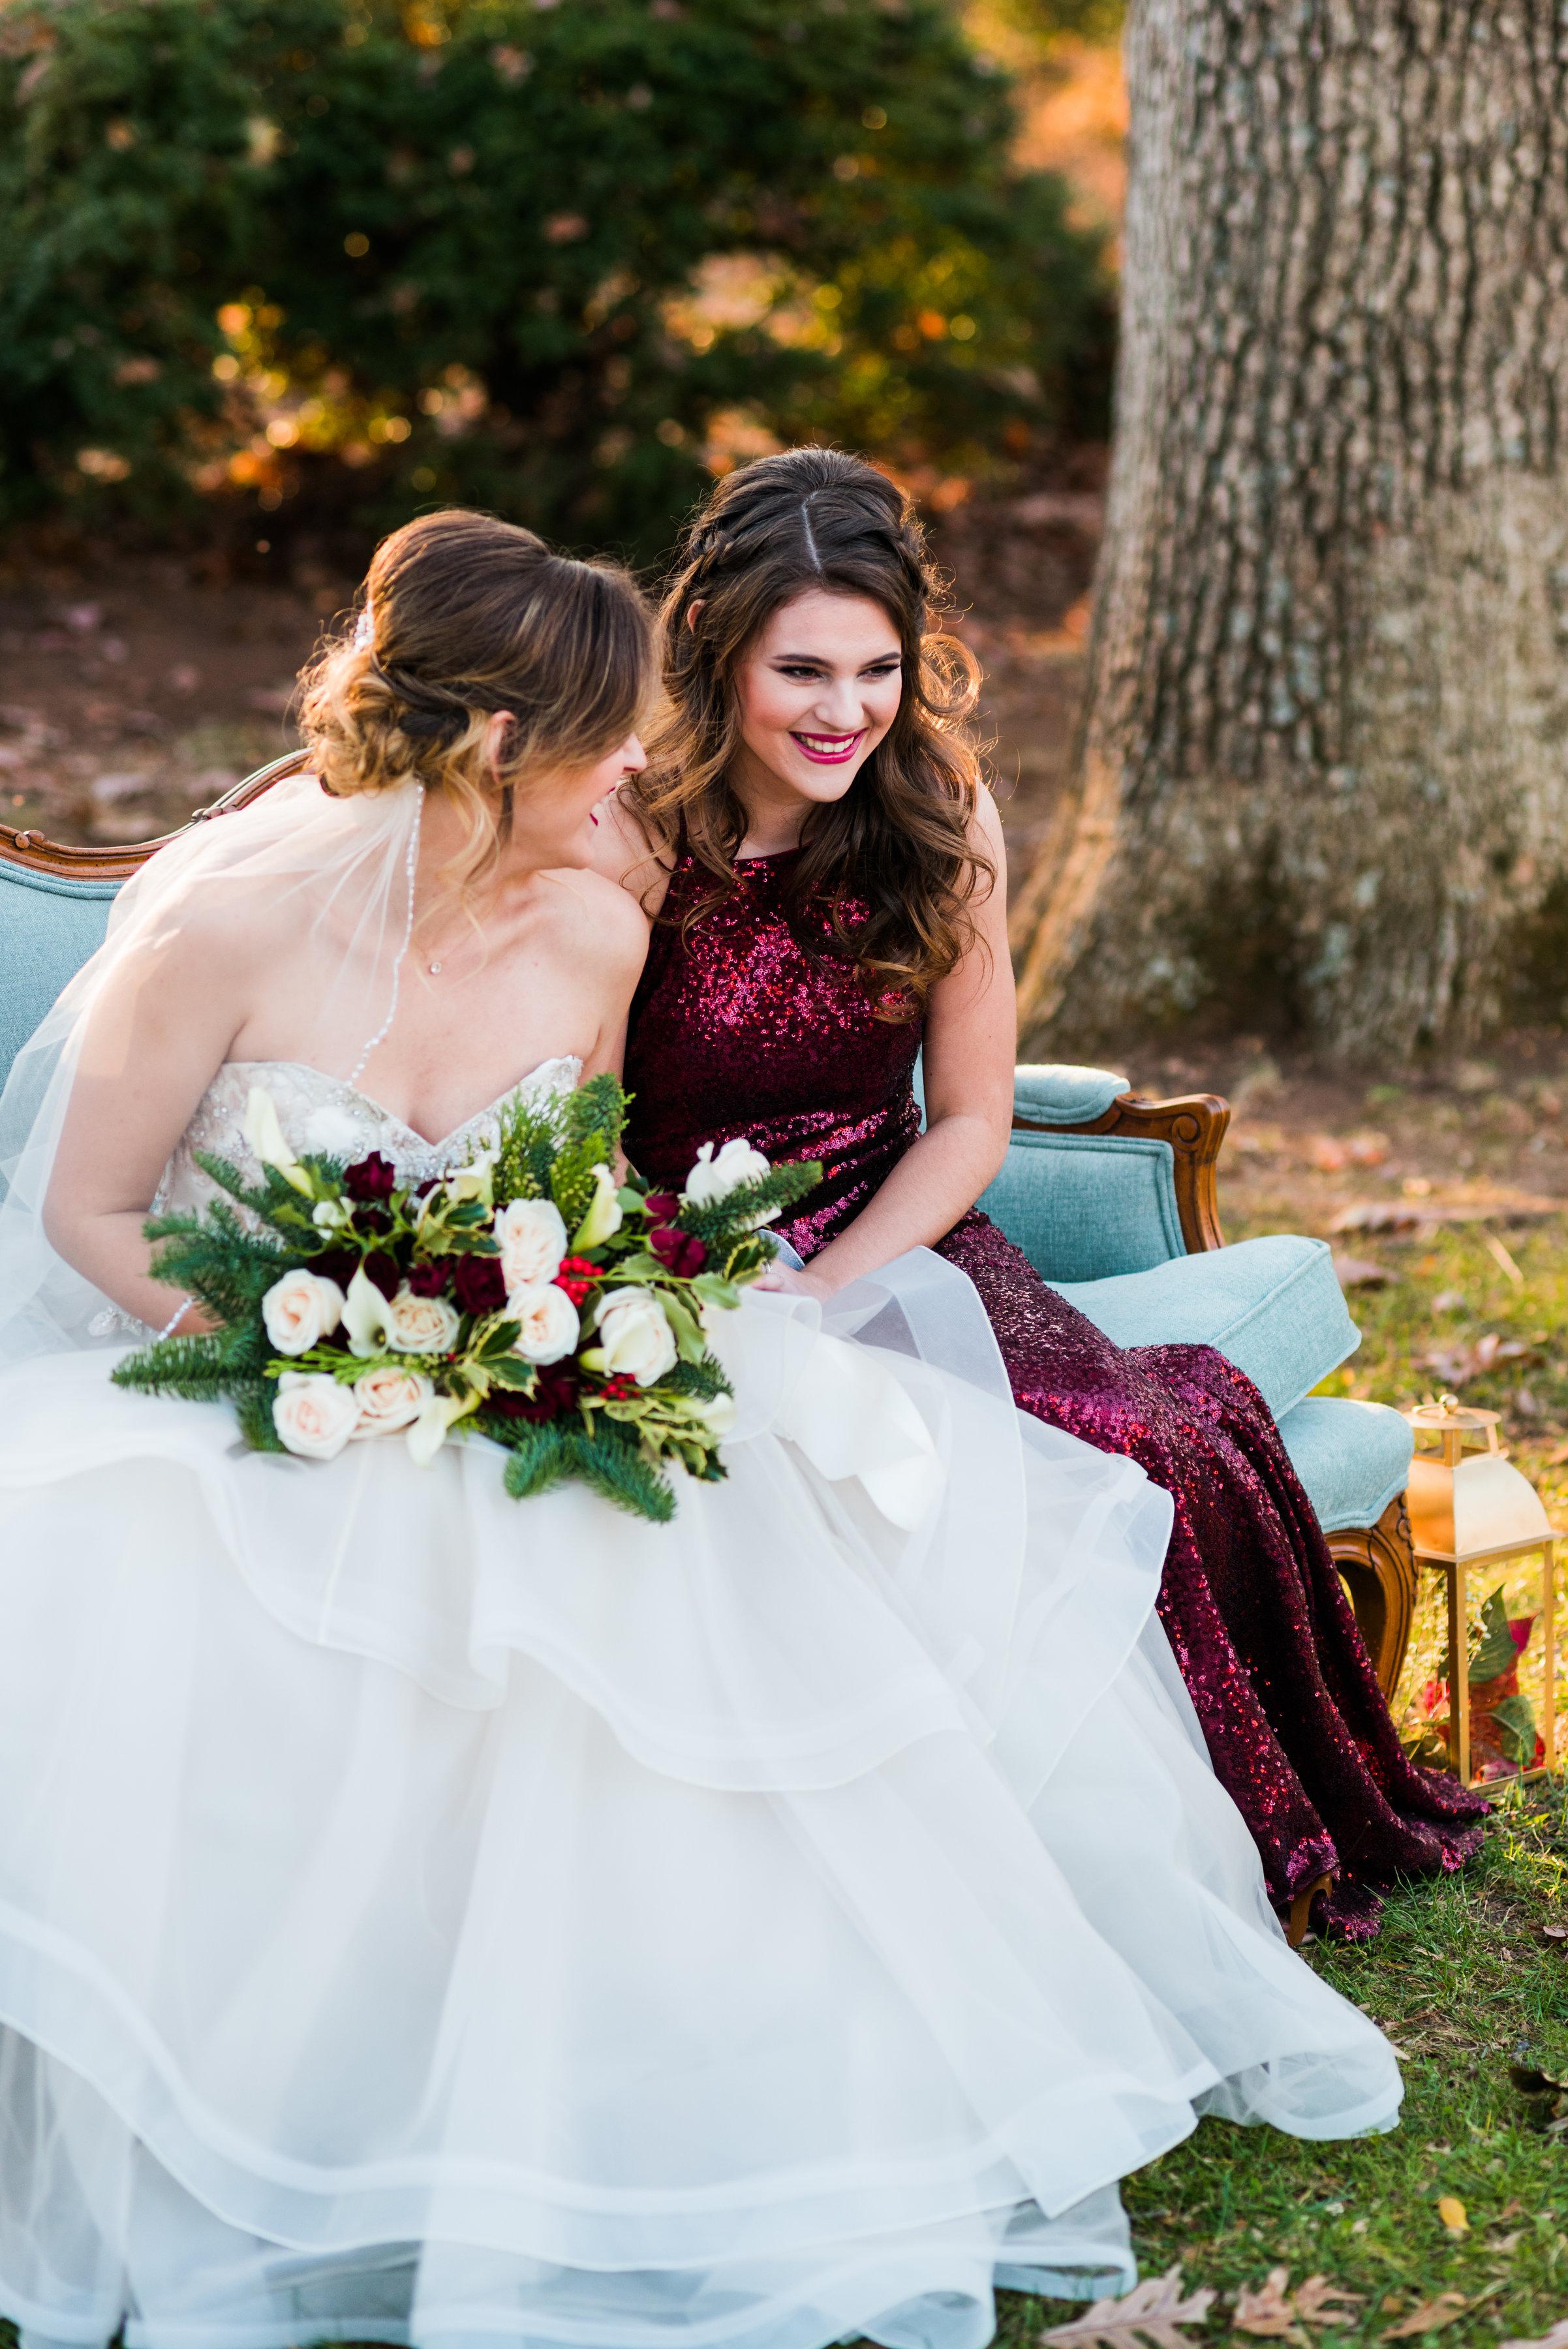 maryland-wedding-photographer-laremore-christmas-wedding-168.jpg